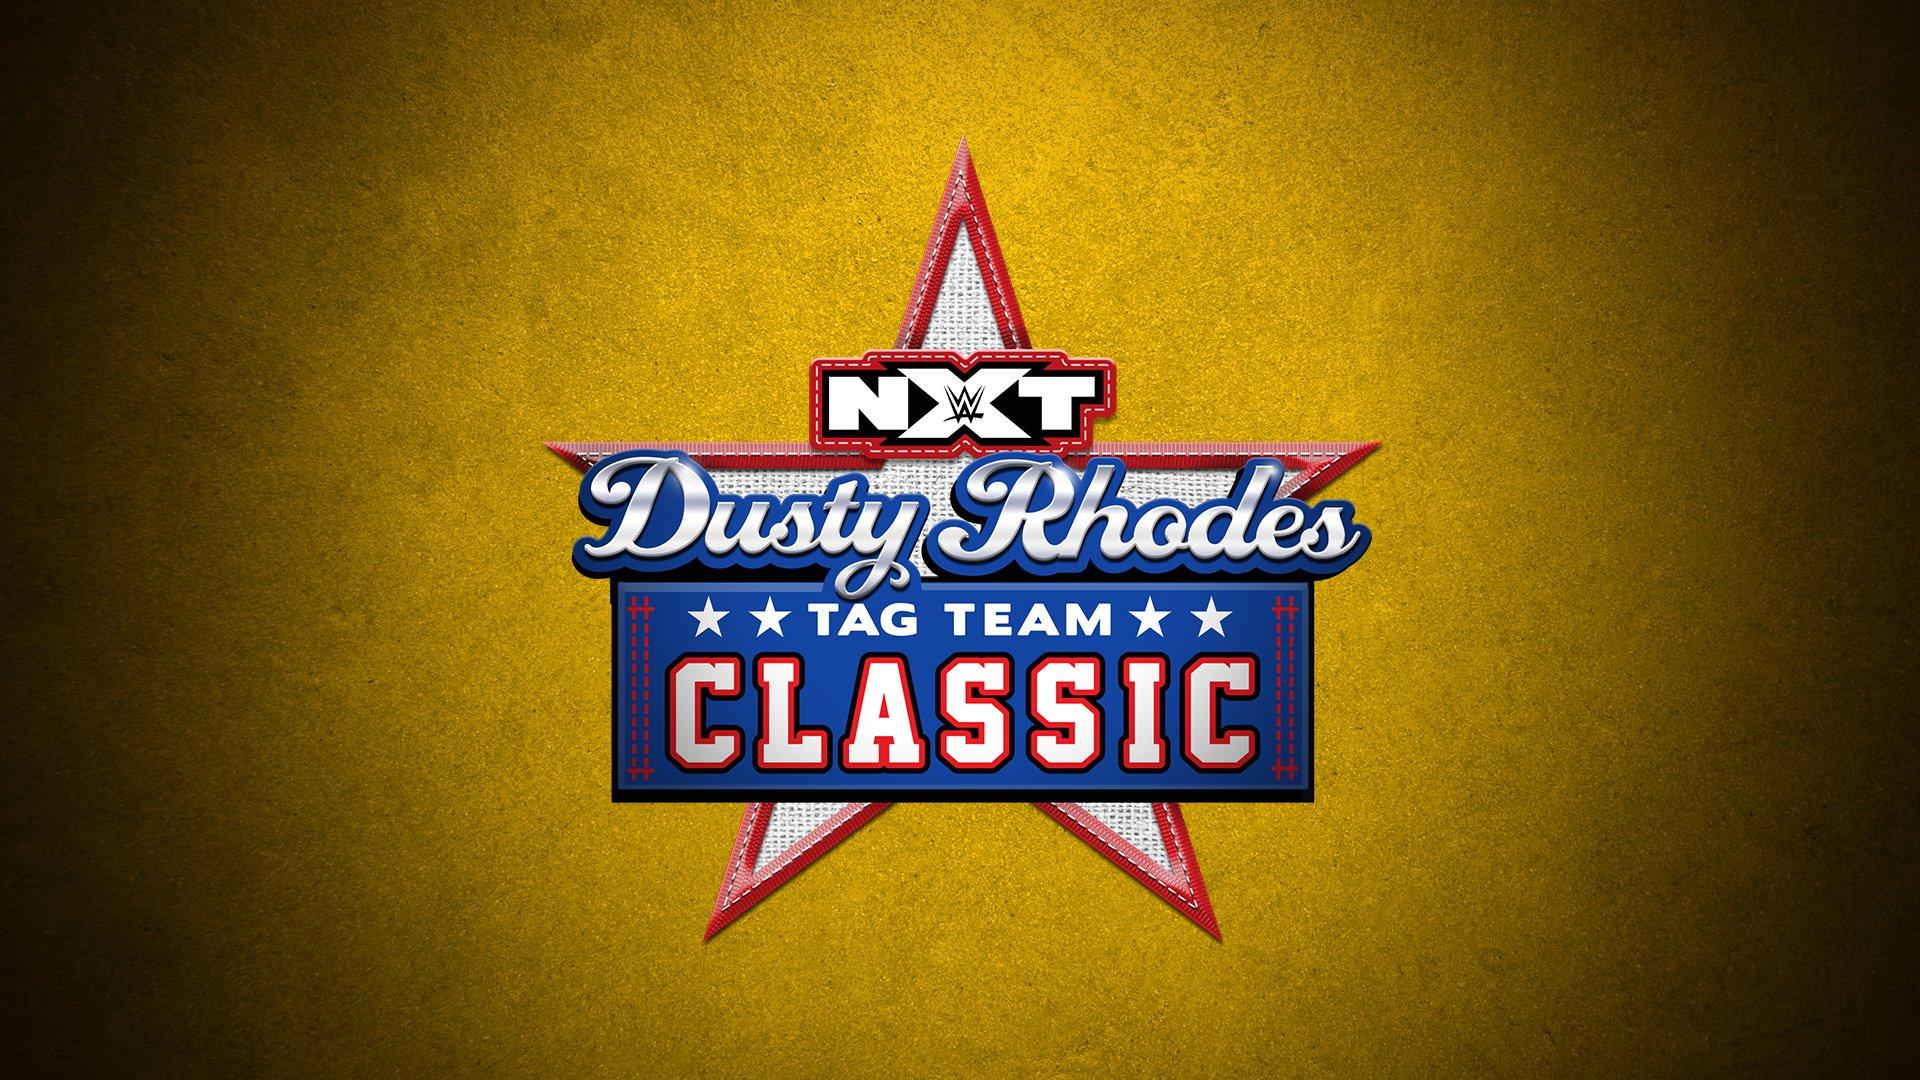 WWE anuncia equipes que estarão no NXT Dusty Rhodes Tag Team Classic